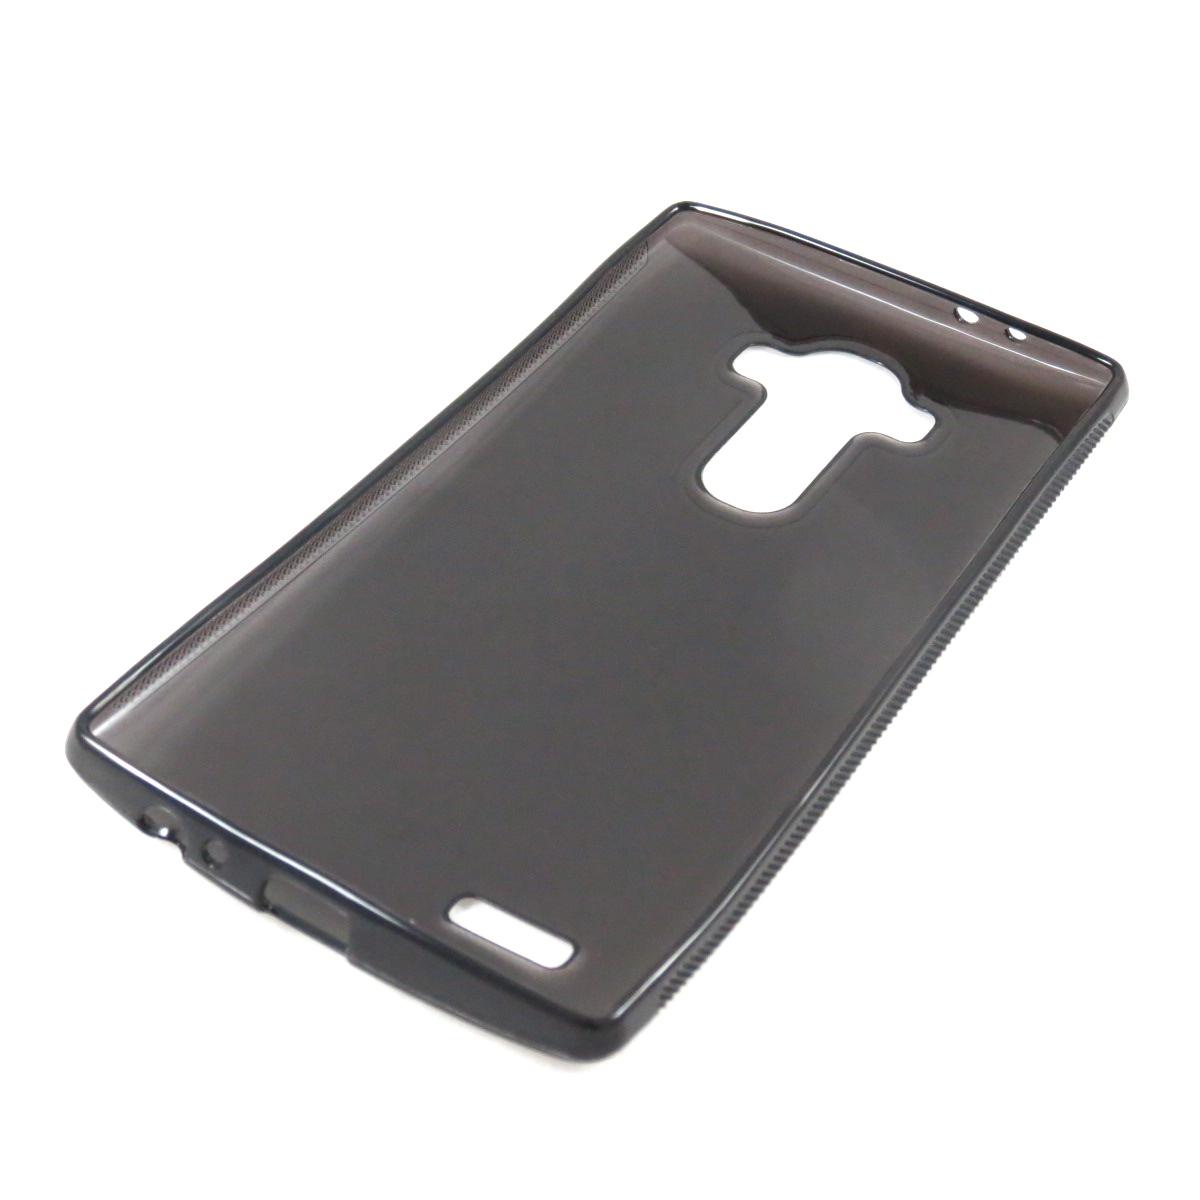 Capa LG G4 - Fumê Silicone TPU